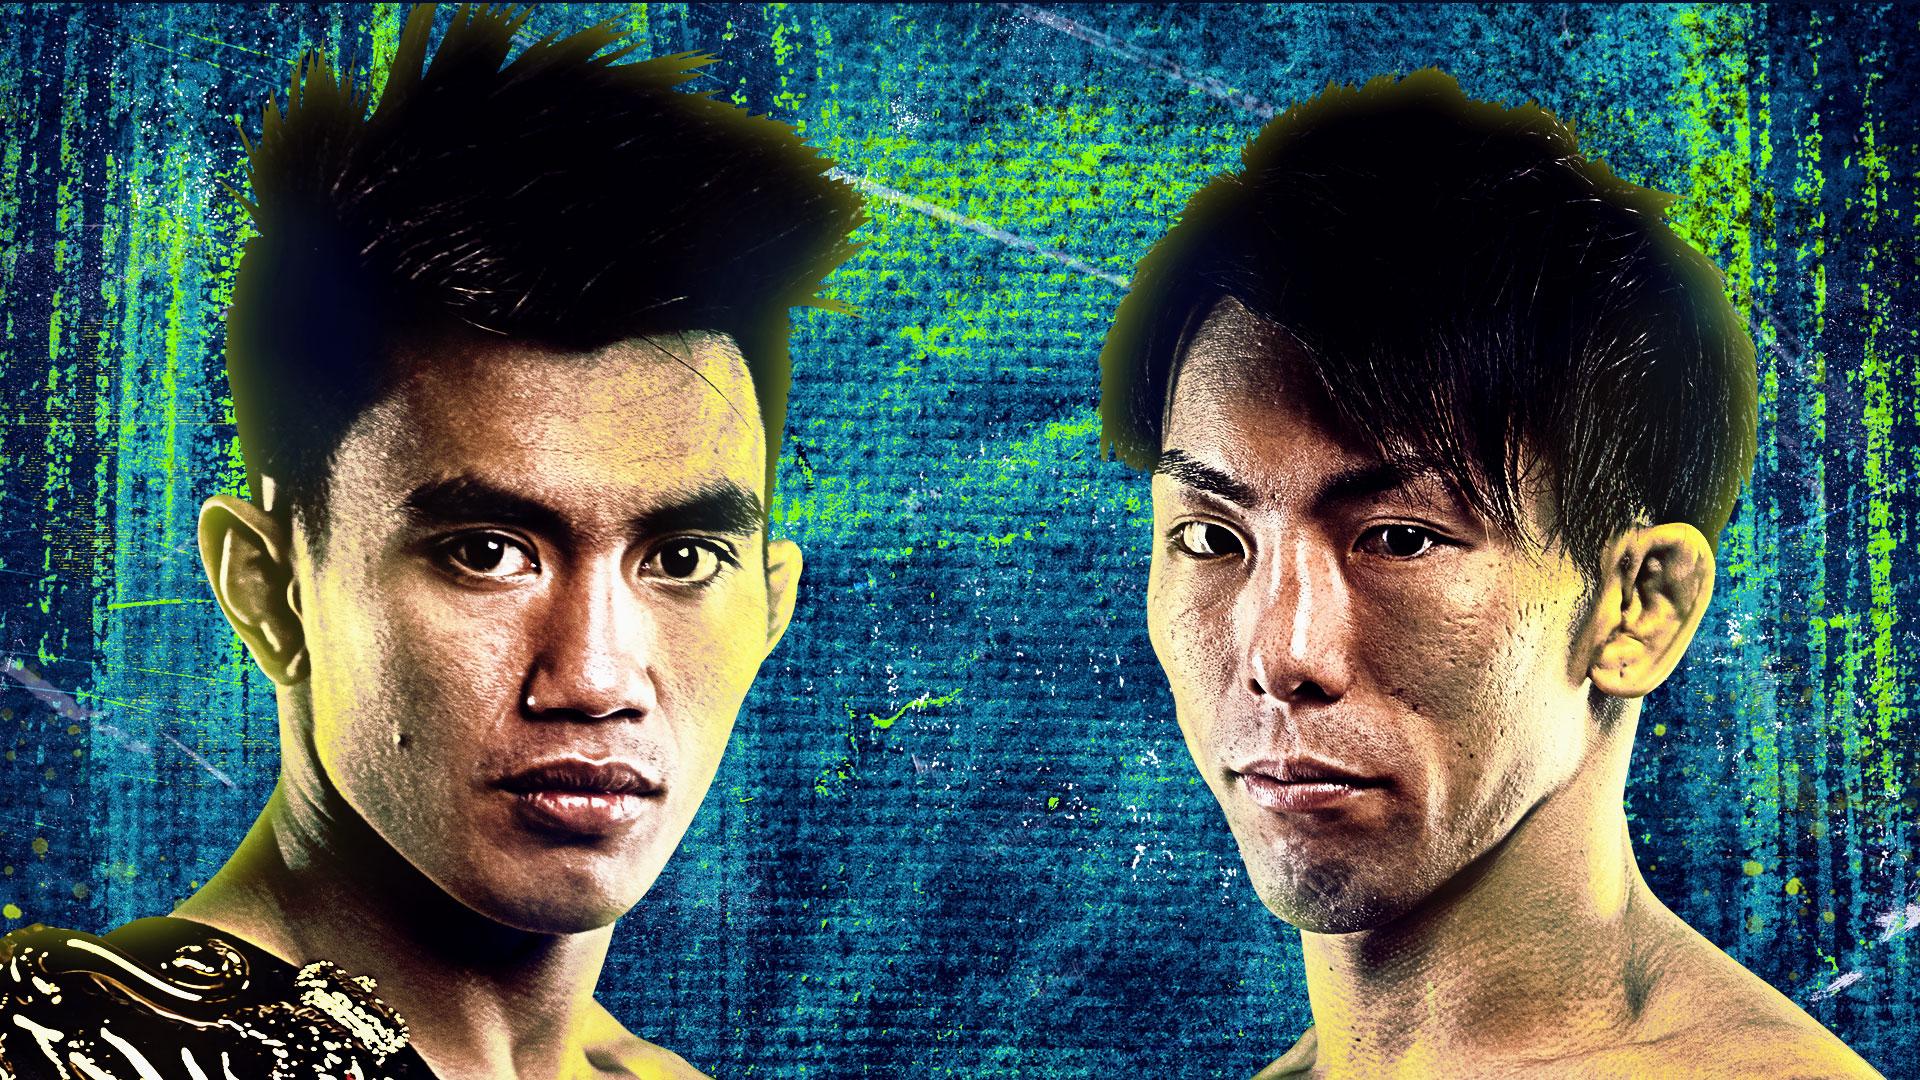 Joshua Pacio defends the ONE Strawweight World Title against Yosuke Saruta at ONE: REVOLUTION